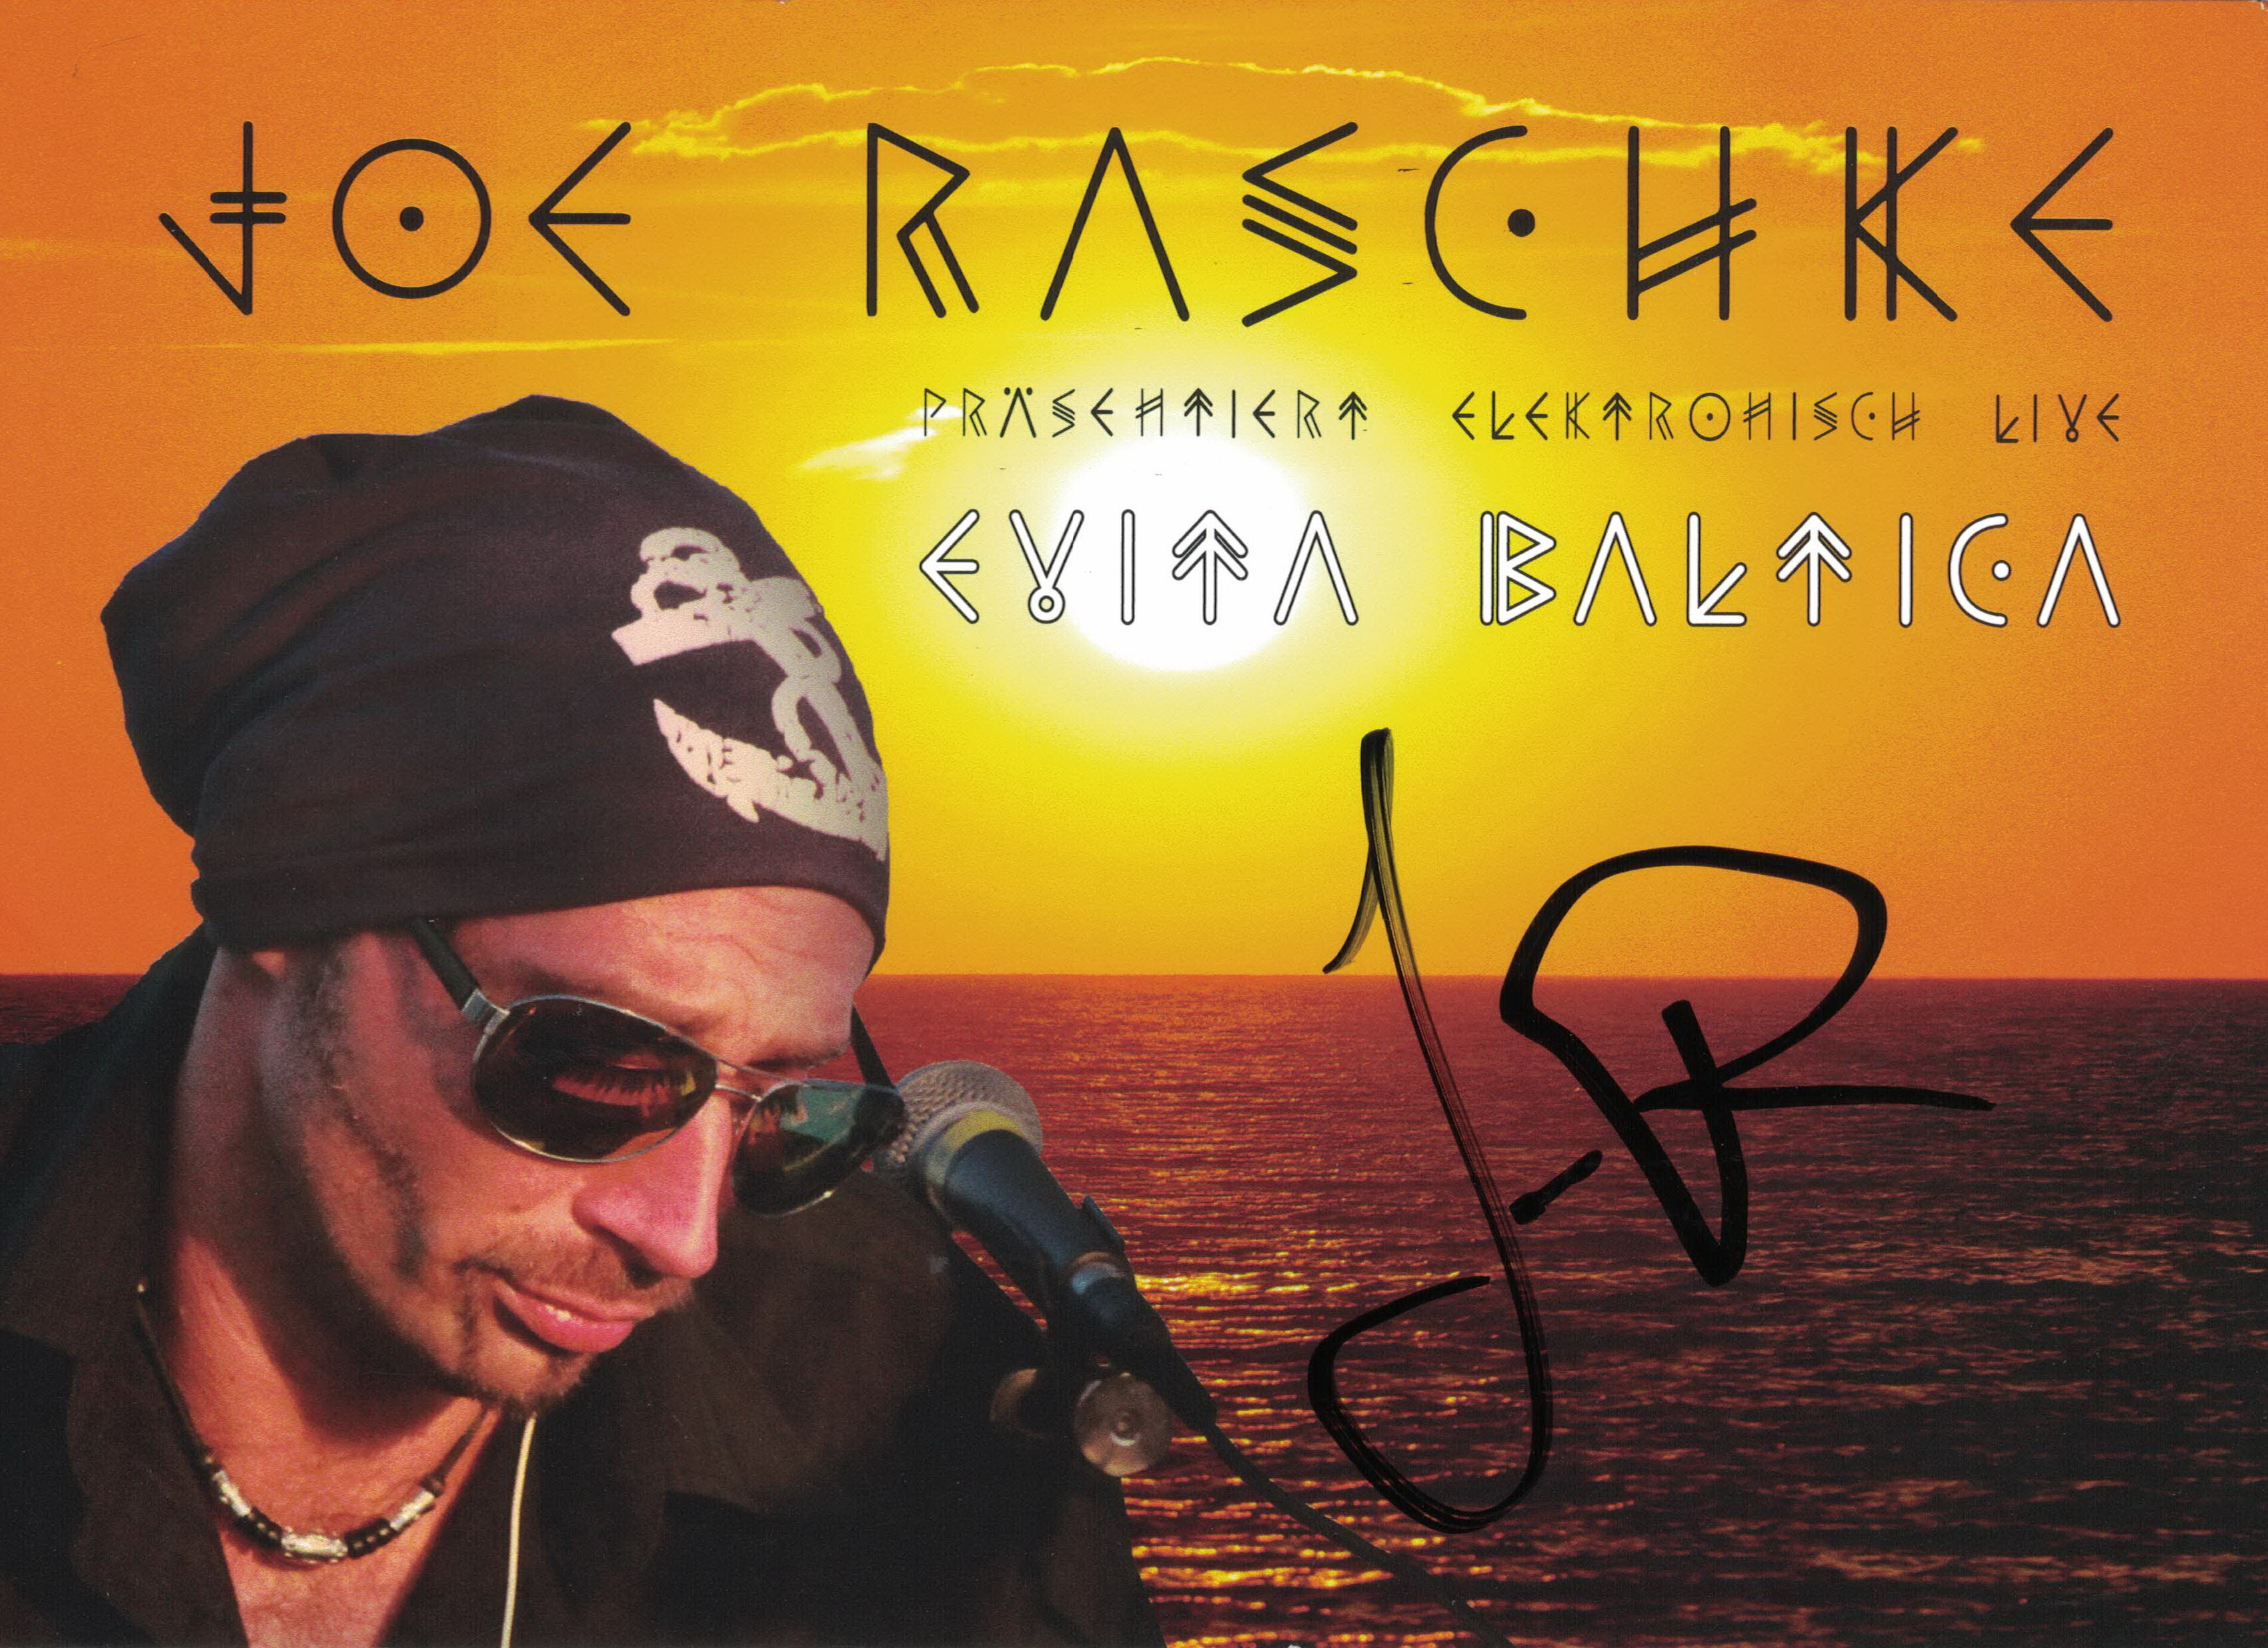 Autogrammkarte_Joe_Raschke_2021_Evita_Baltica